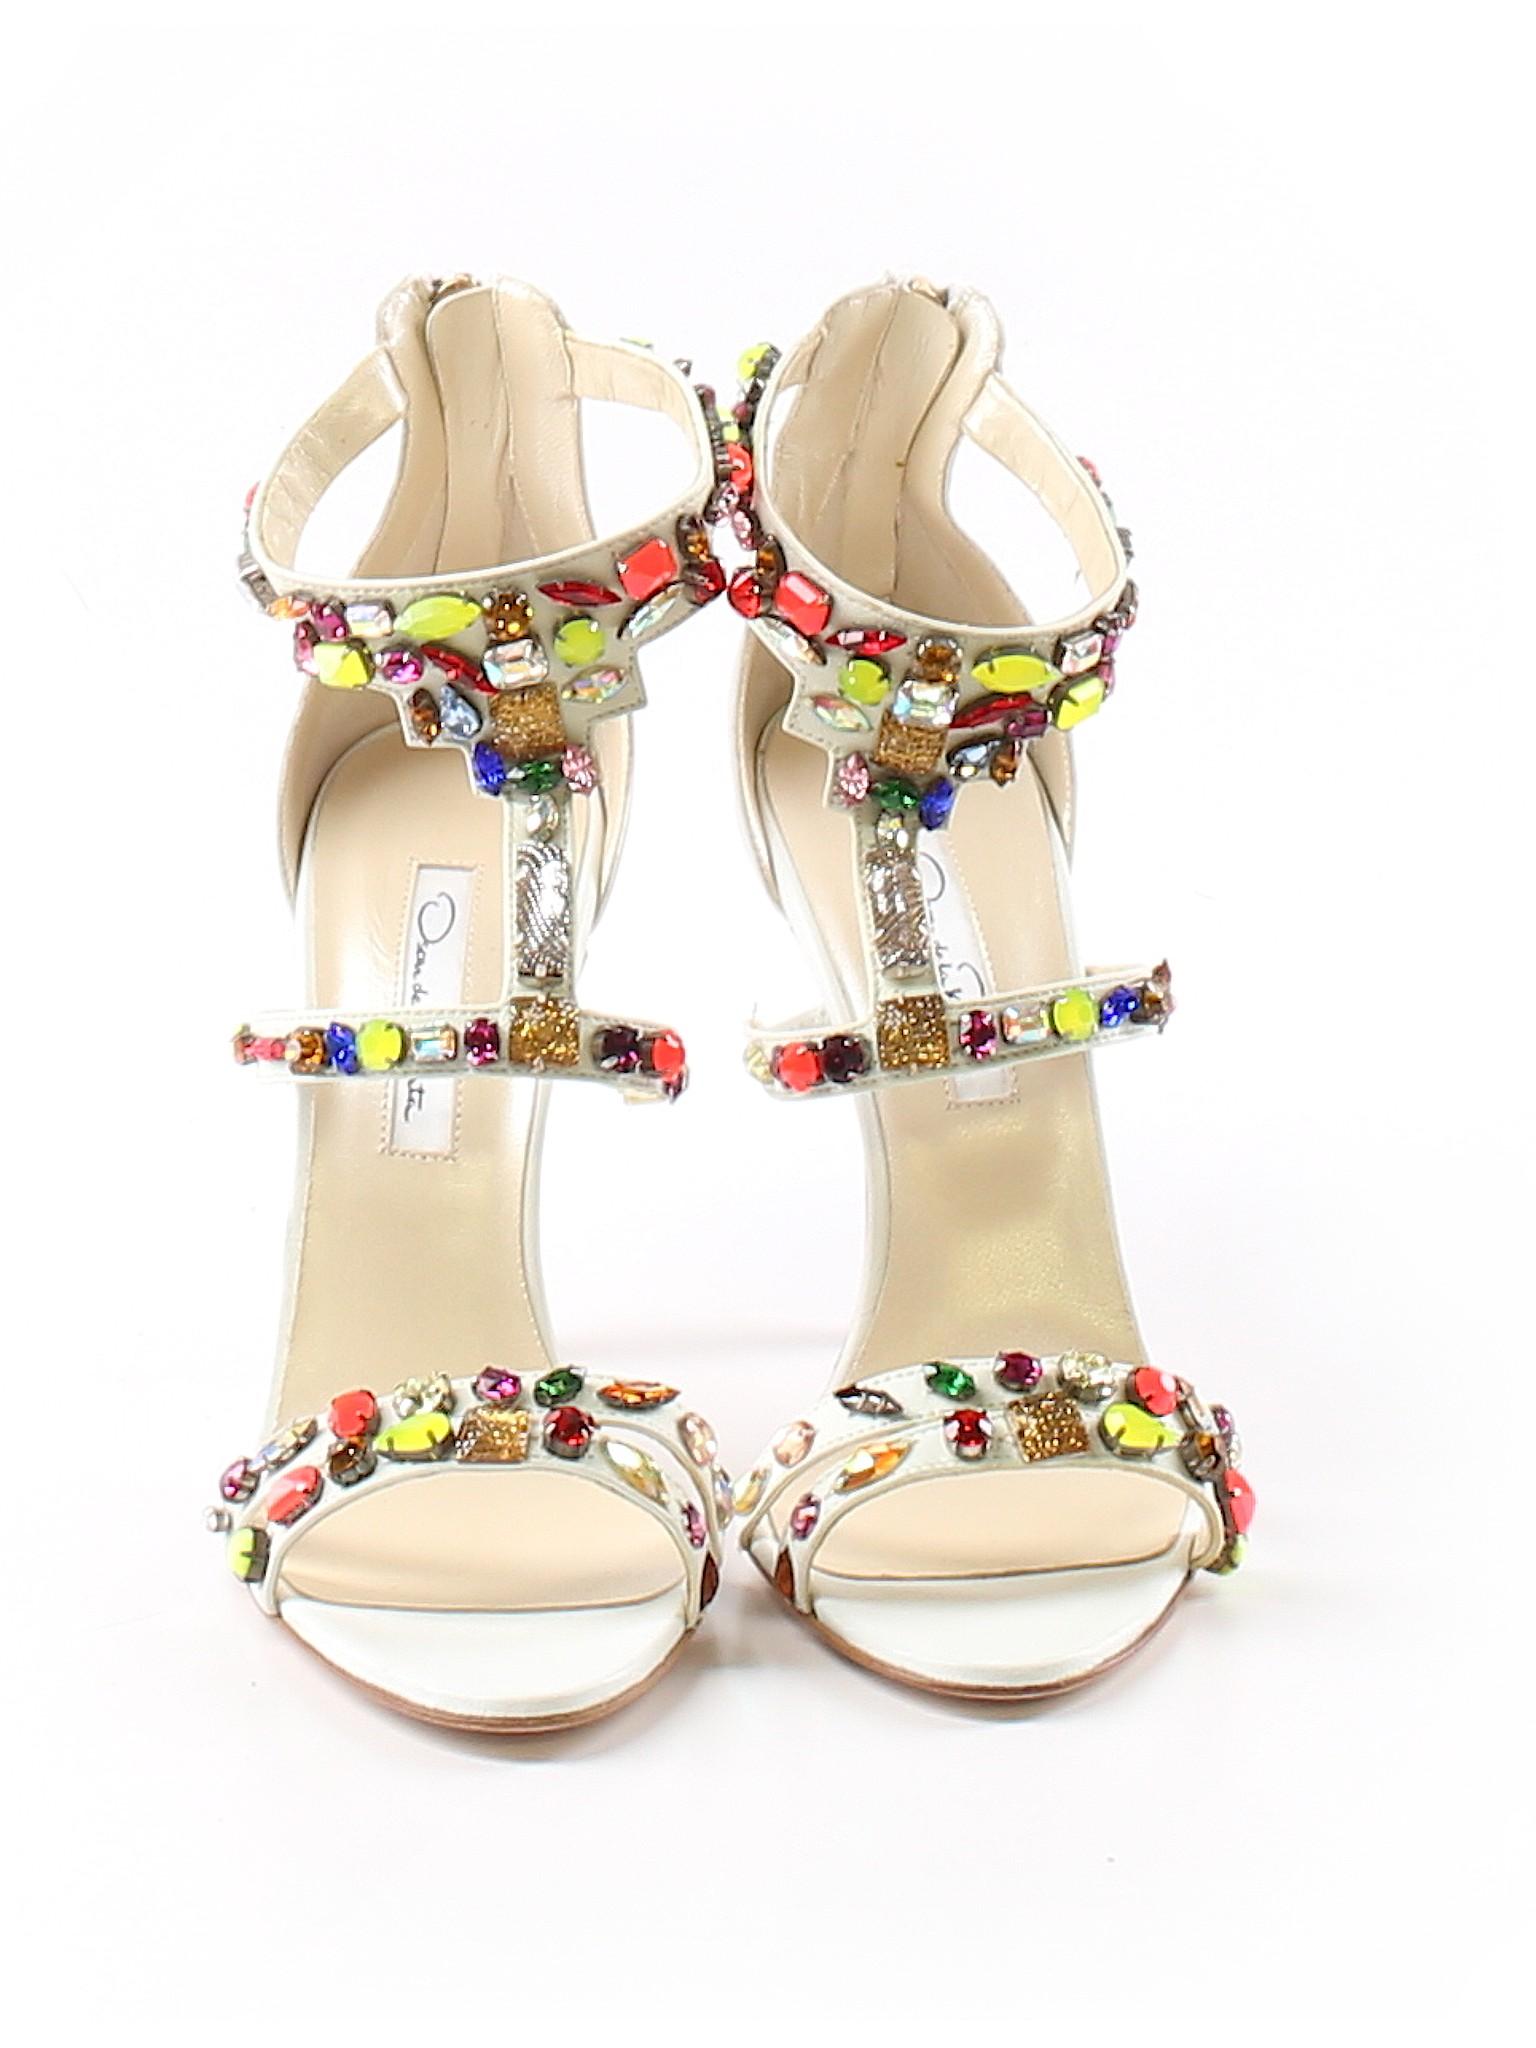 Nappa Renta Oscar Ivory Boutique De promotion heels La Simona qIaH0w5